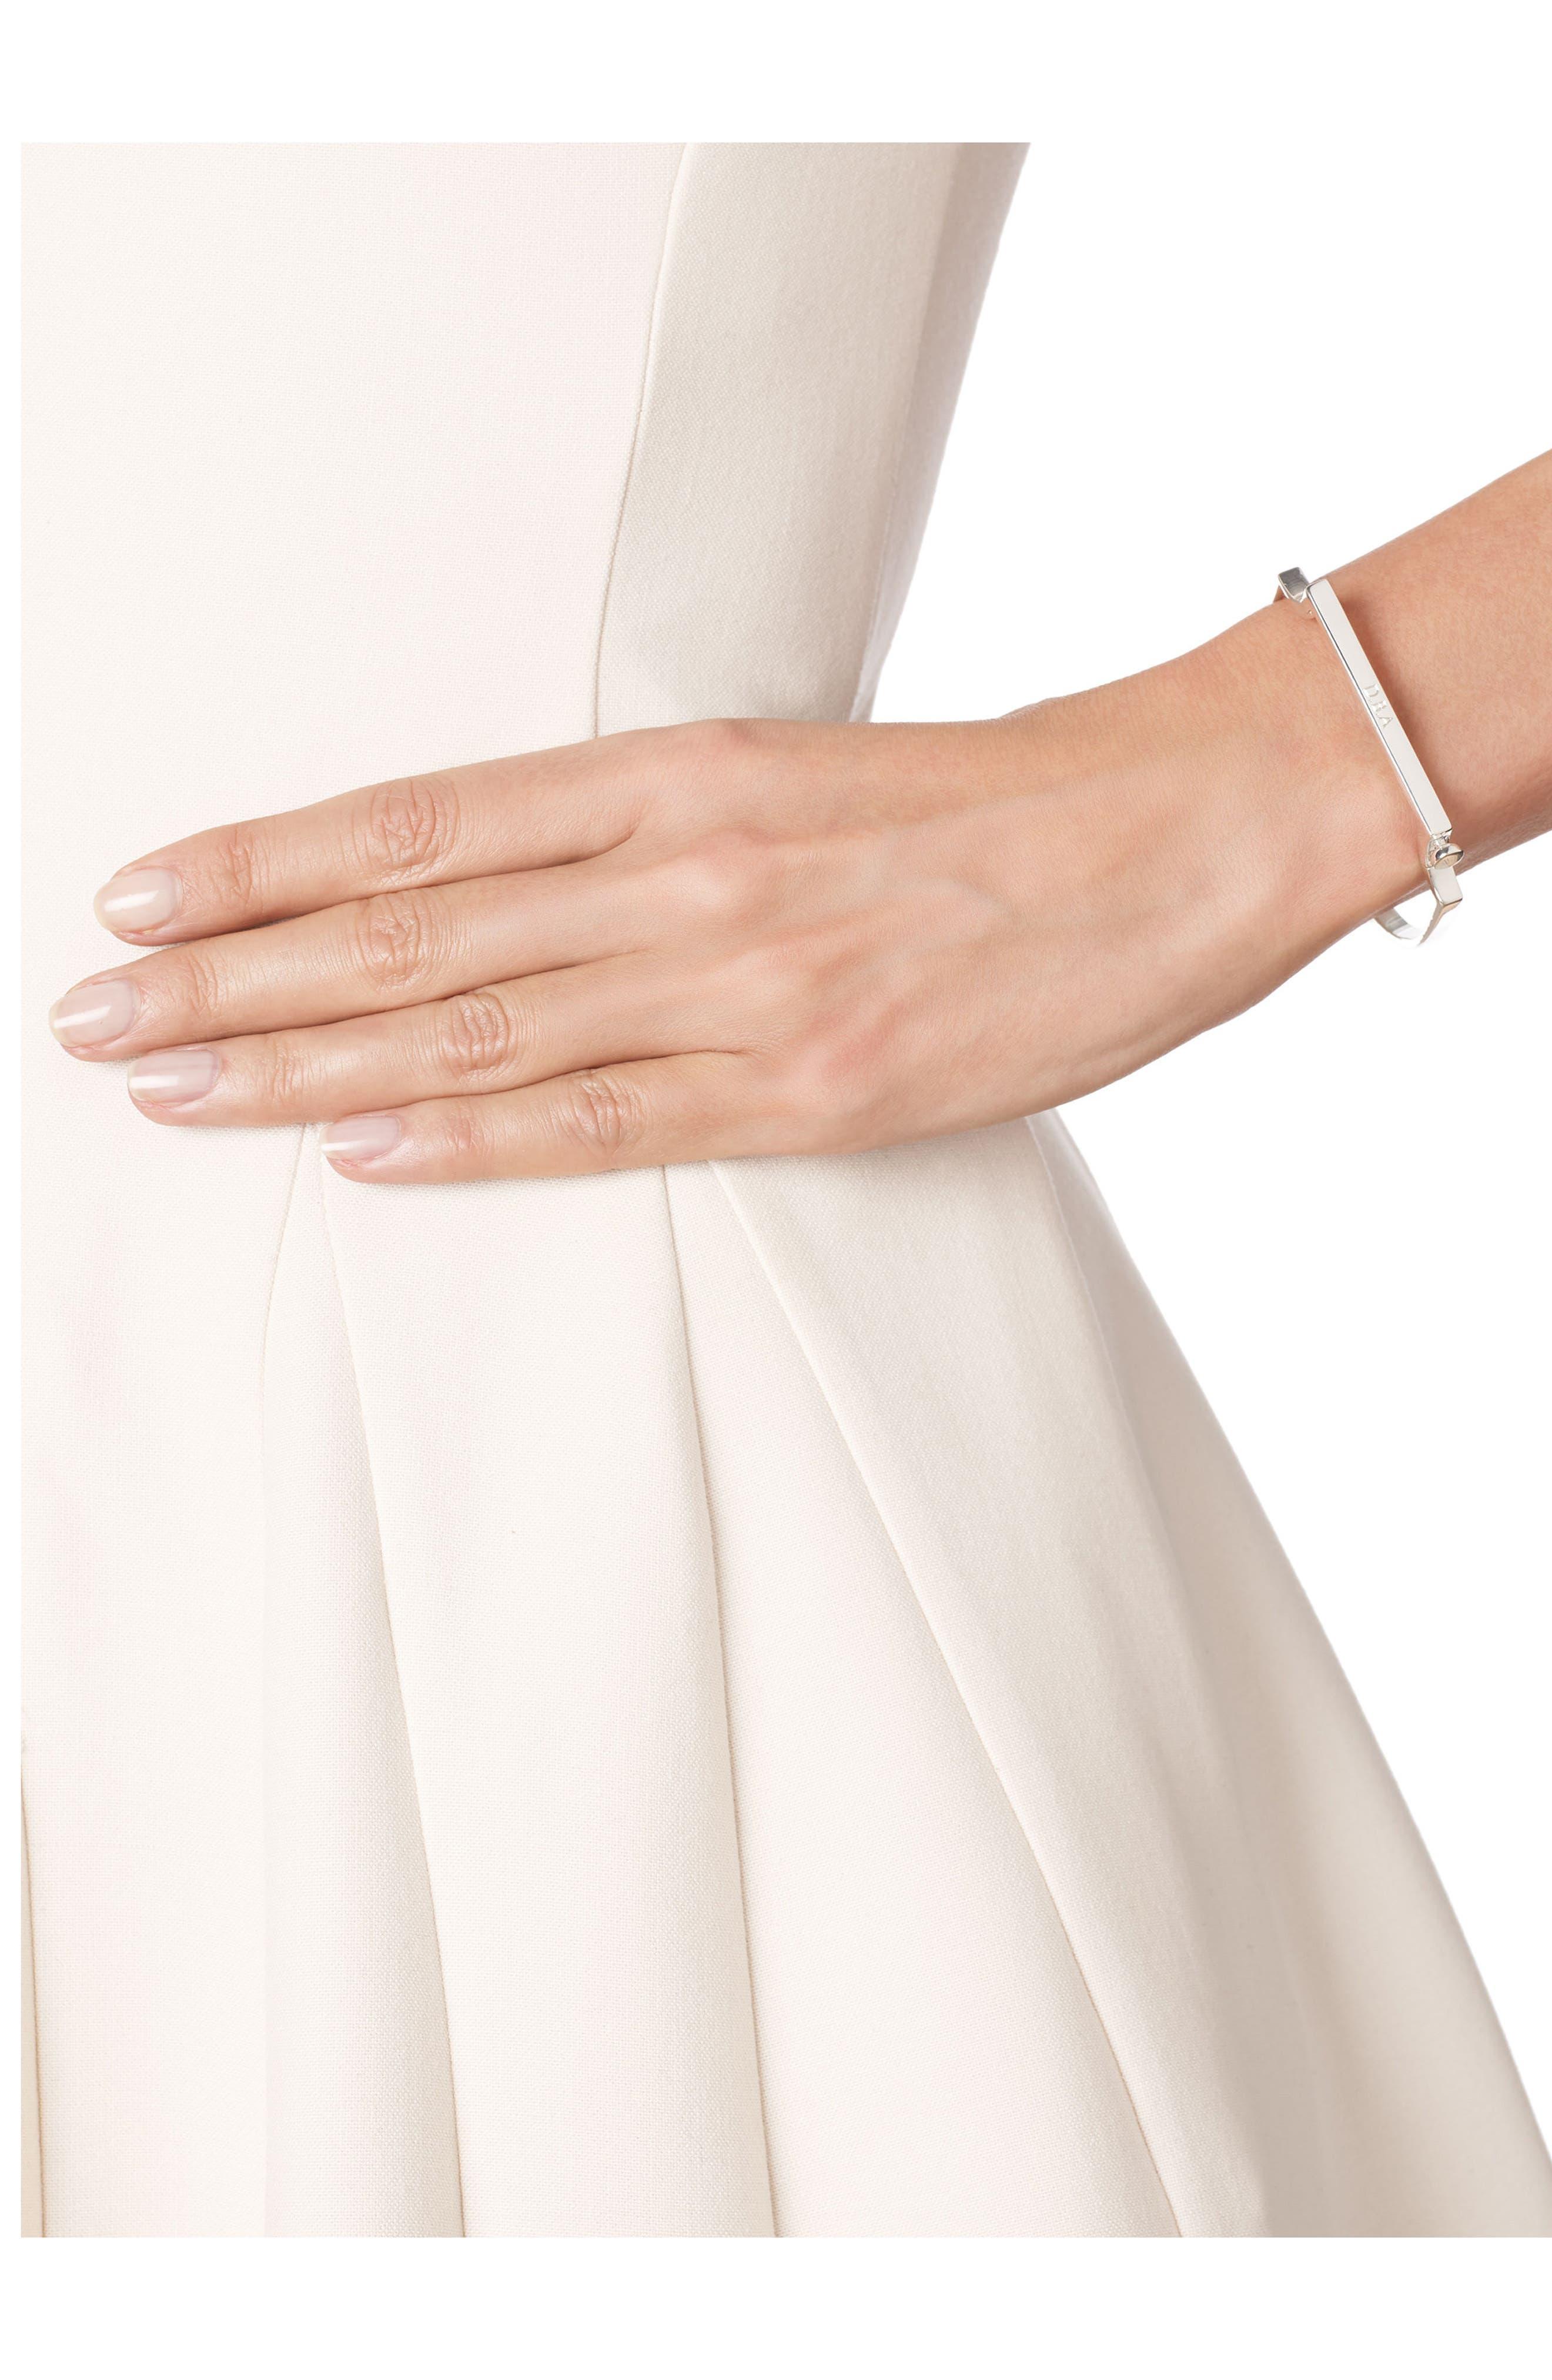 MONICA VINADER, Engravable Signature Thin Bangle Bracelet, Alternate thumbnail 5, color, SILVER